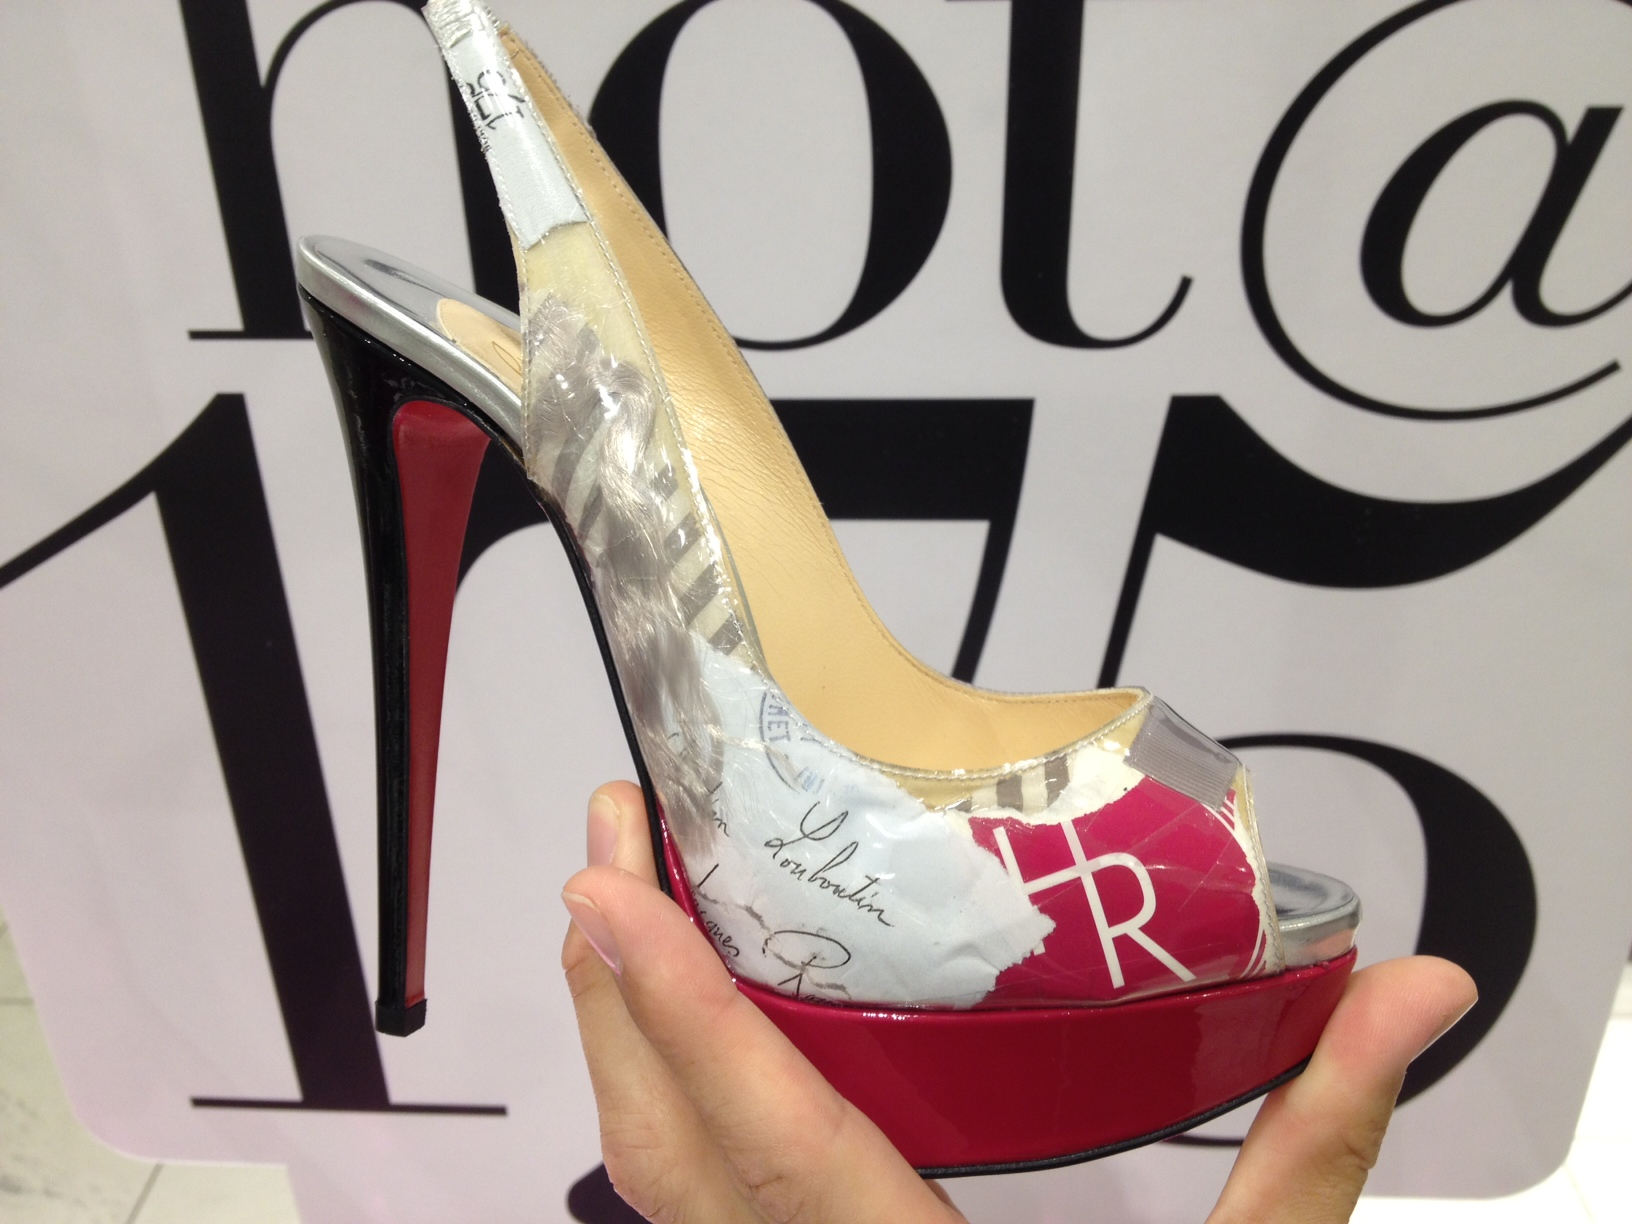 11c883890e4 Atlassian CrowdID - Where To Buy Christian Louboutin Shoes Near Me ...